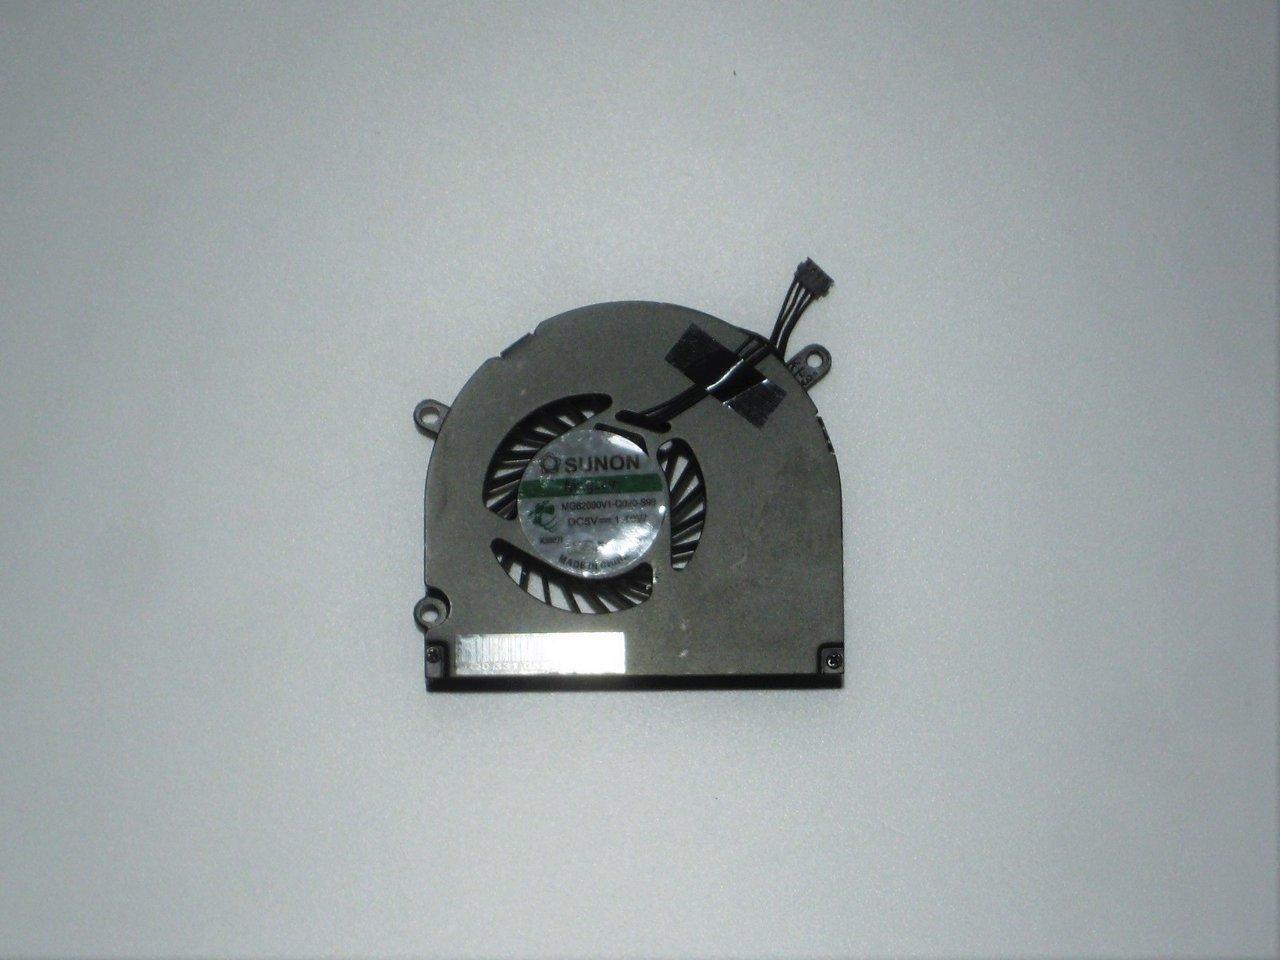 Sunon MG50050V1-C01C-S9A Lüfter Apple Macbook Pro A1278 A1286 A1342